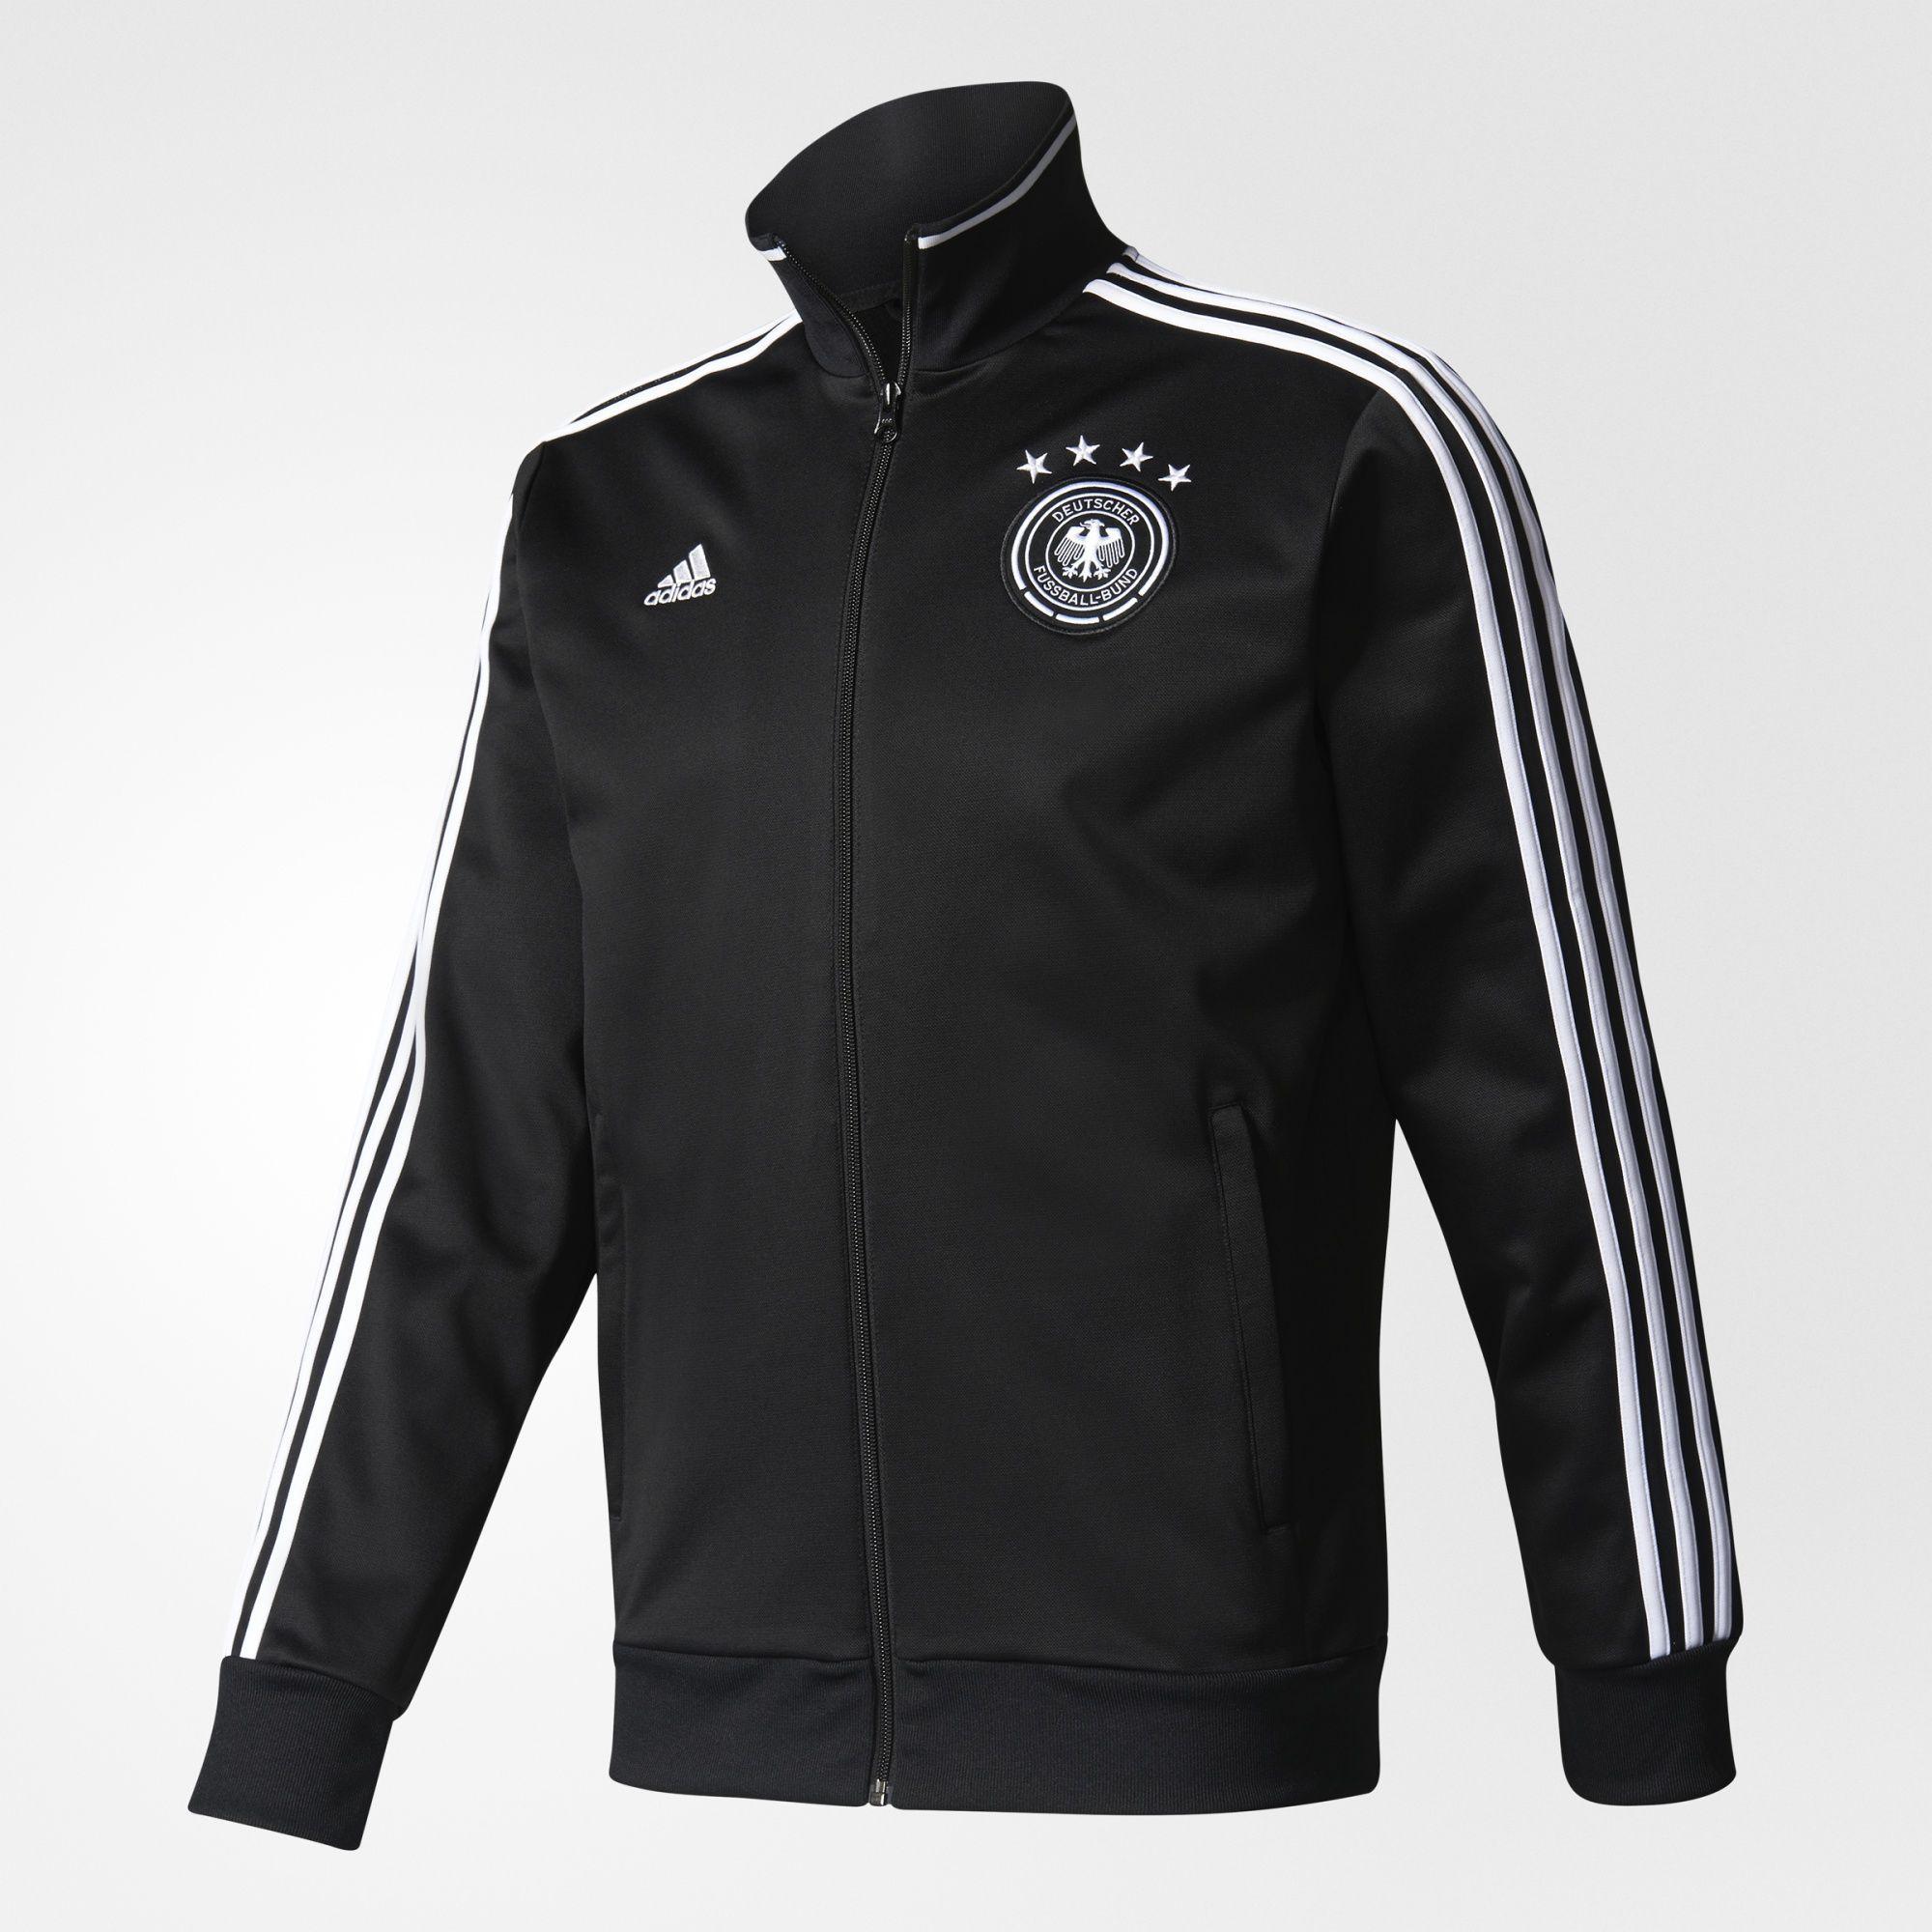 adidas - Germany 3-Stripes Track Jacket